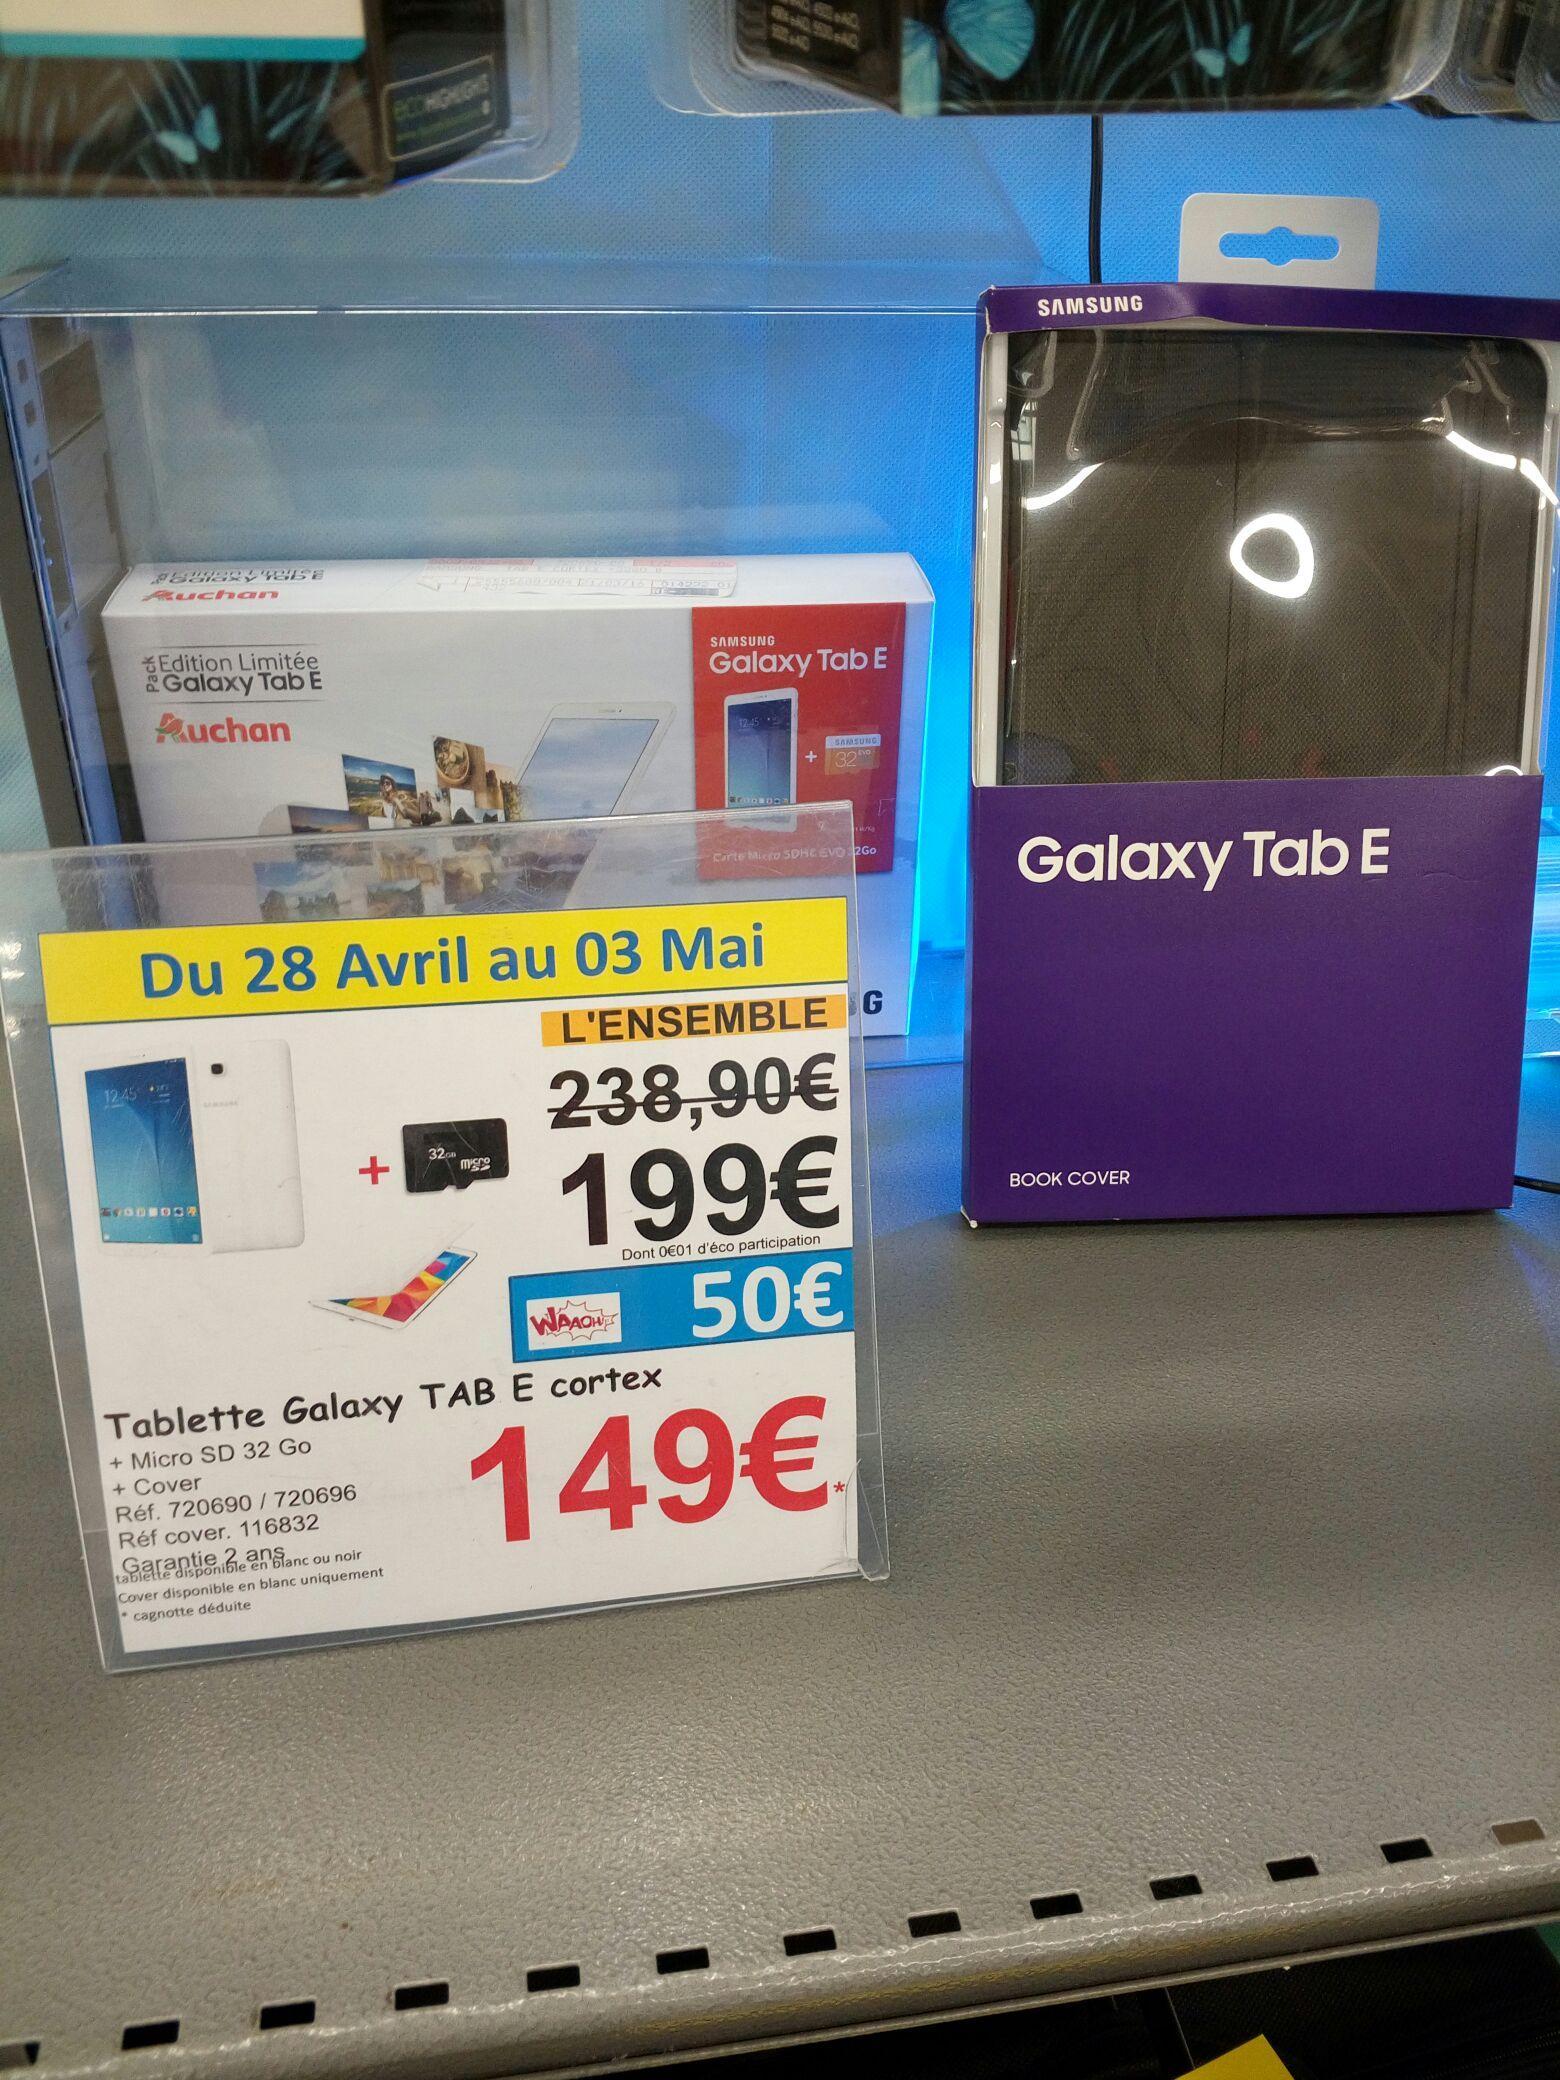 "Tablette 9.6"" Samsung Galaxy Tab E + micro sd 32gb + Cover officiel (via 50€carte Waaoh)"